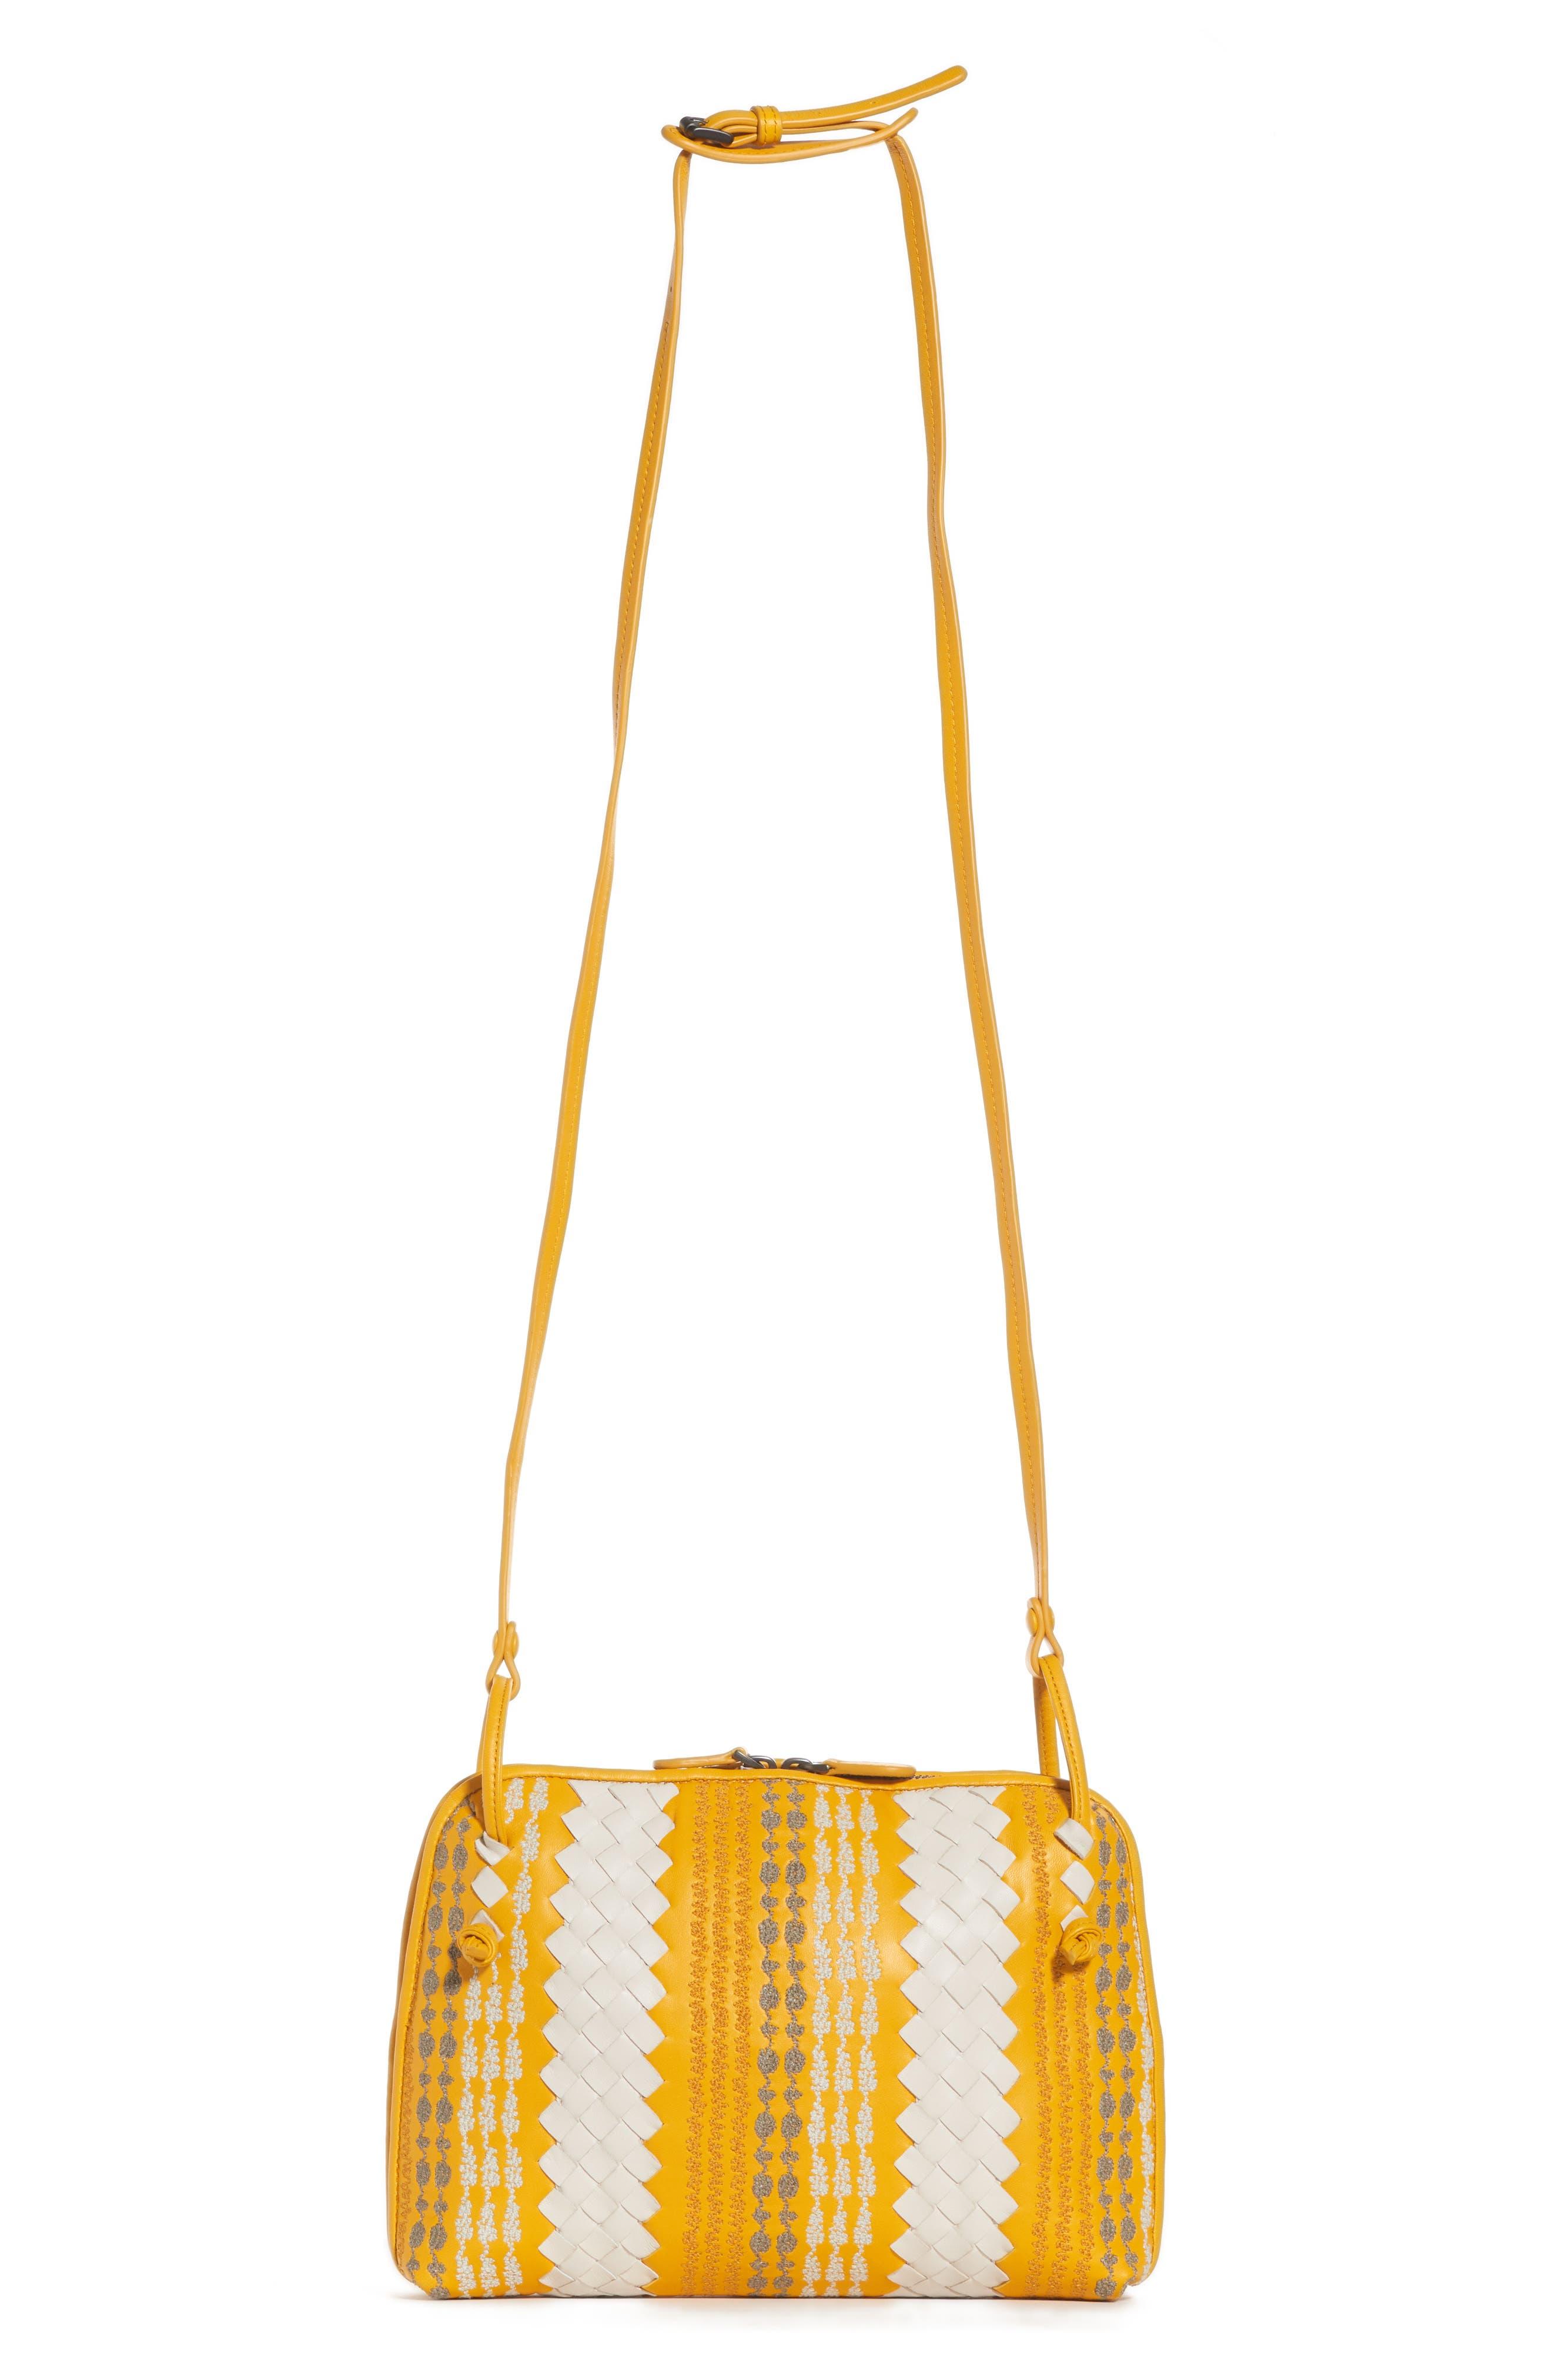 Bottega Veneta Nodini Appia Leather Crossbody Bag